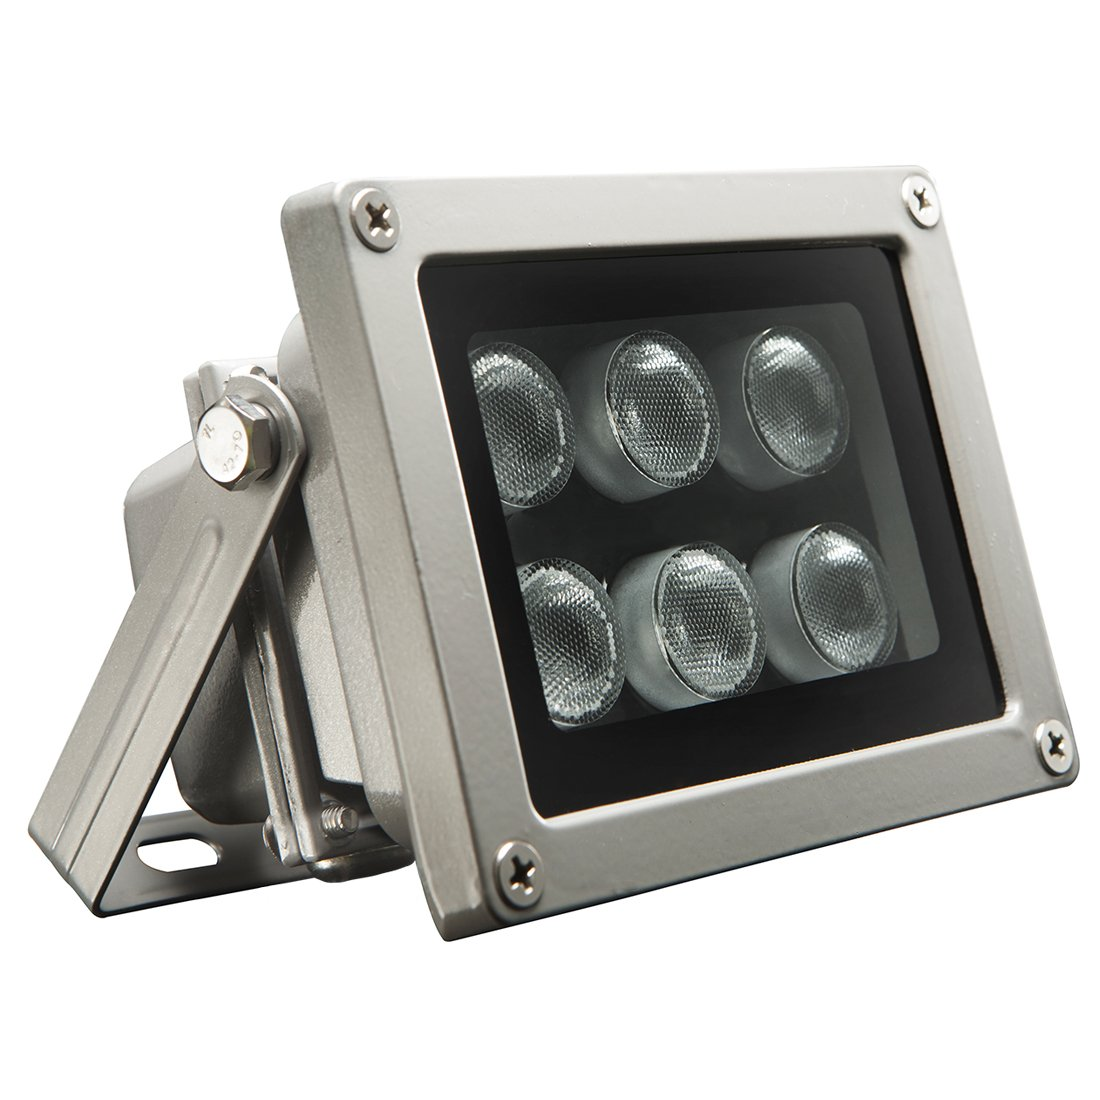 Univivi Infrared Illuminator, 850nm 6 LEDs 90 Degree Wide Angle IR Illuminator for Night Vision,Waterproof LED Infrared Light for IP Camera,CCTV Security Camera by Univivi